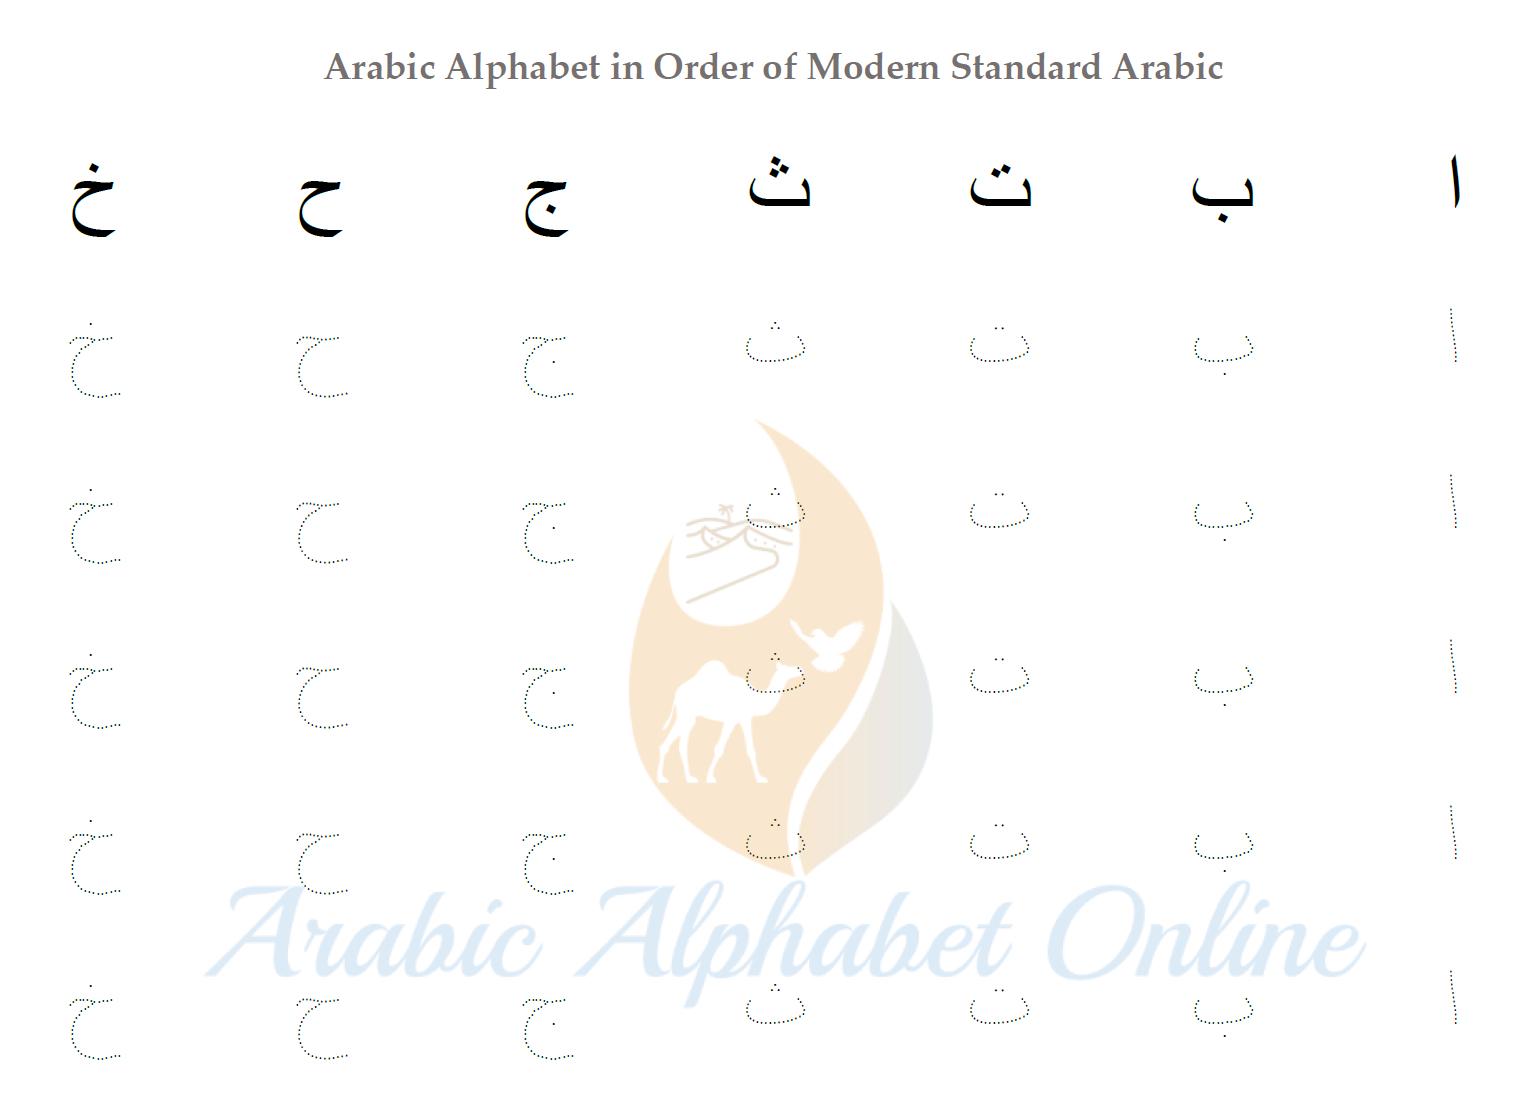 Arabic Letters | Arabic Alphabet Online حروف العربية with Arabic Letters Tracing Worksheets Pdf